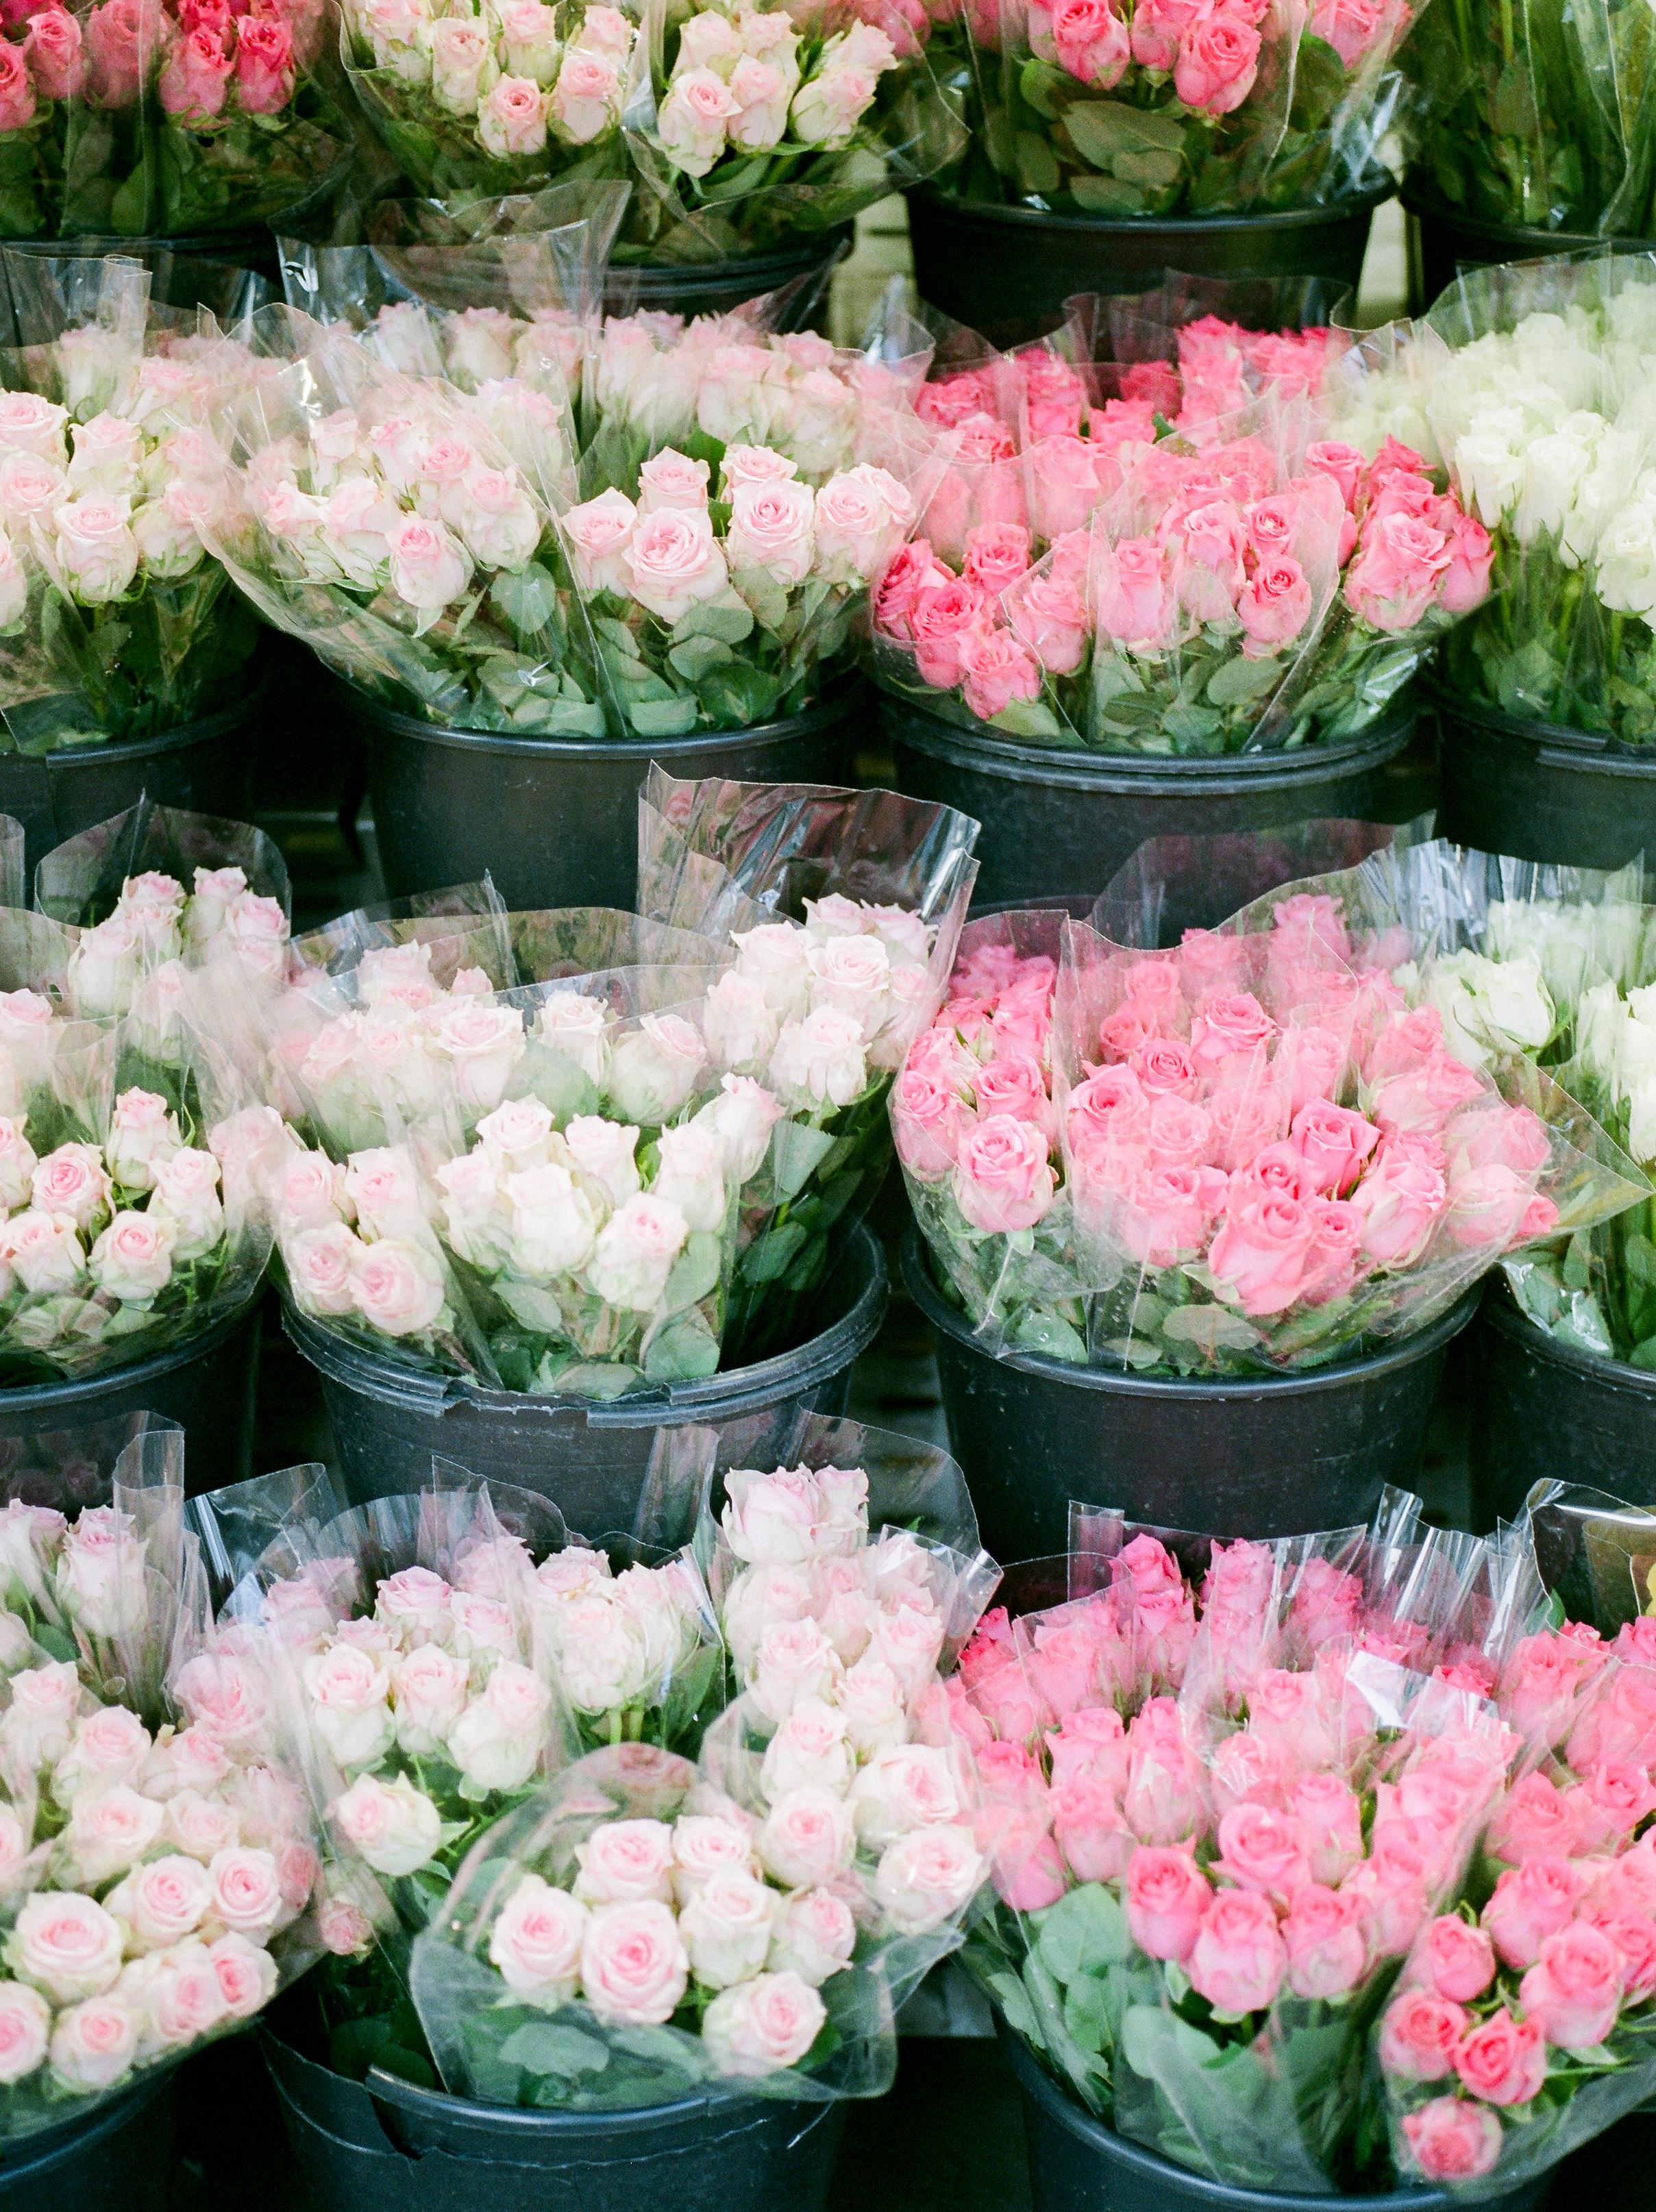 fresh-roses-in-paris-market.jpg